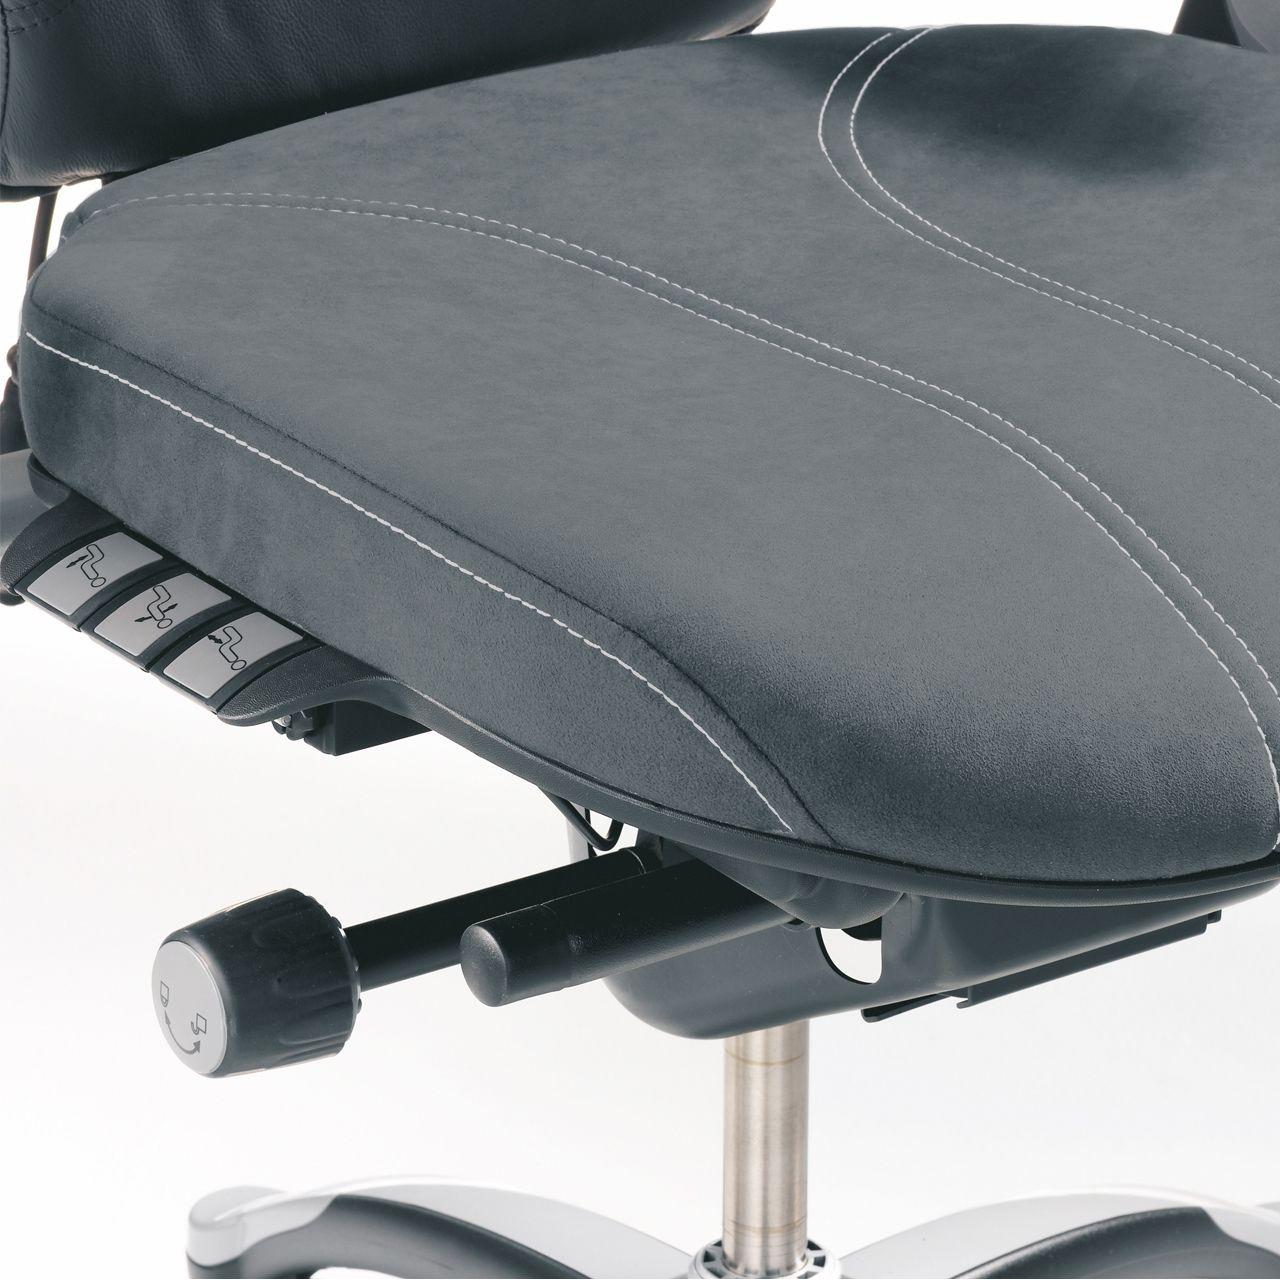 rh logic 300 xl bureaustoel STKALOG303 detail